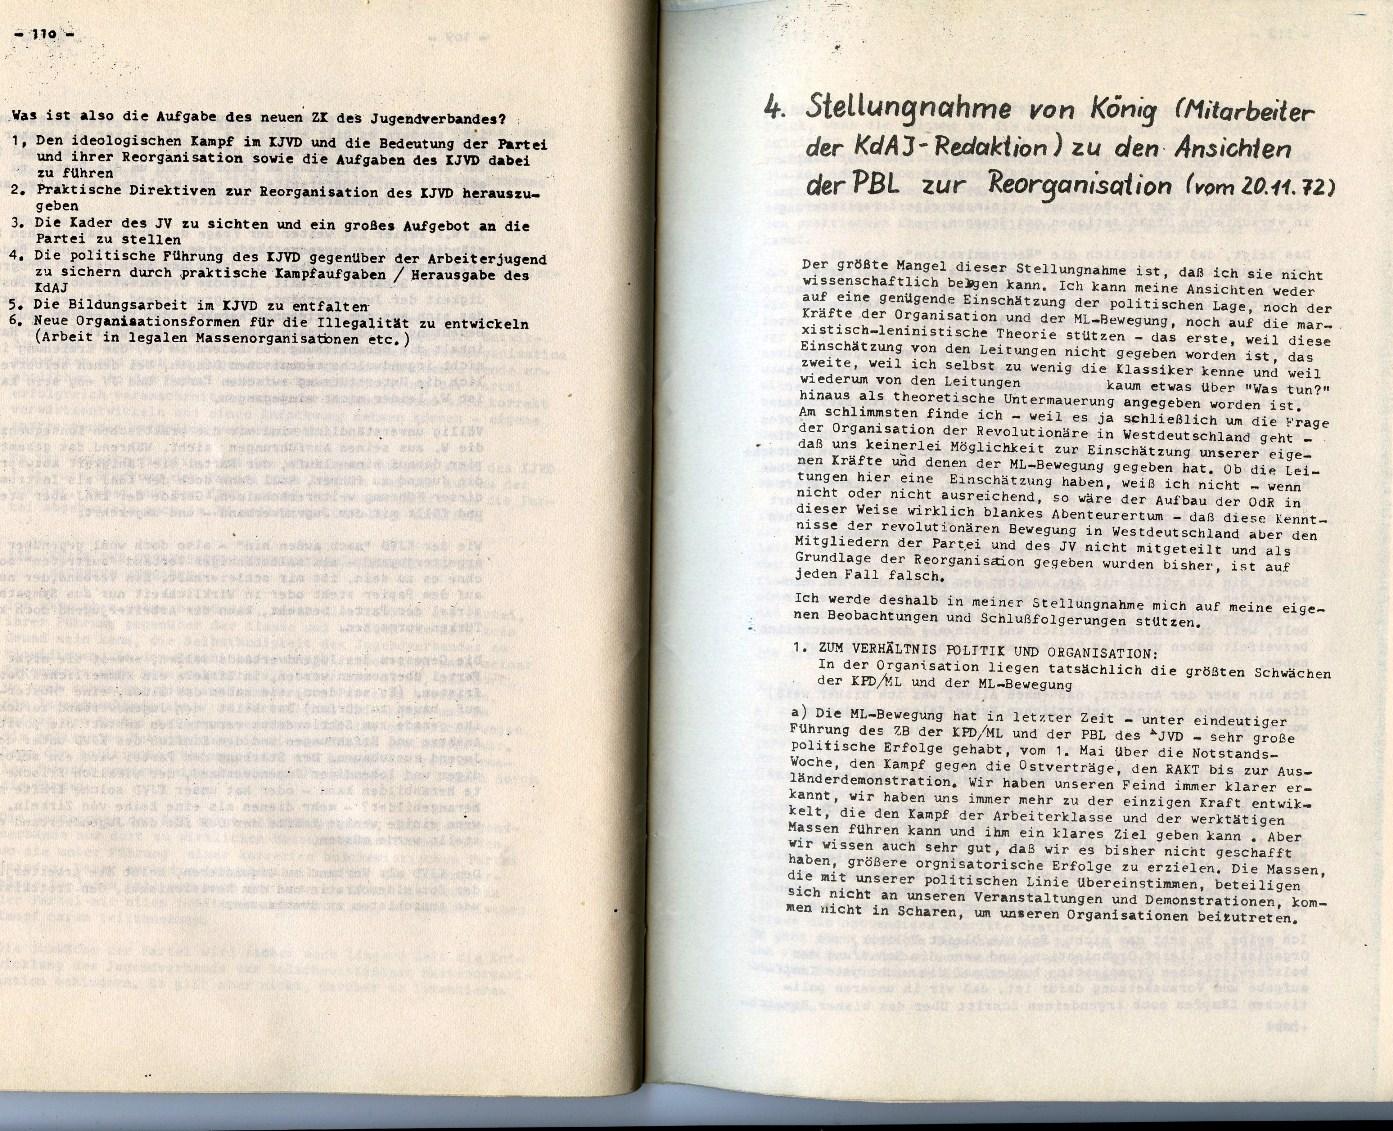 ZB_Universitas_1972_59